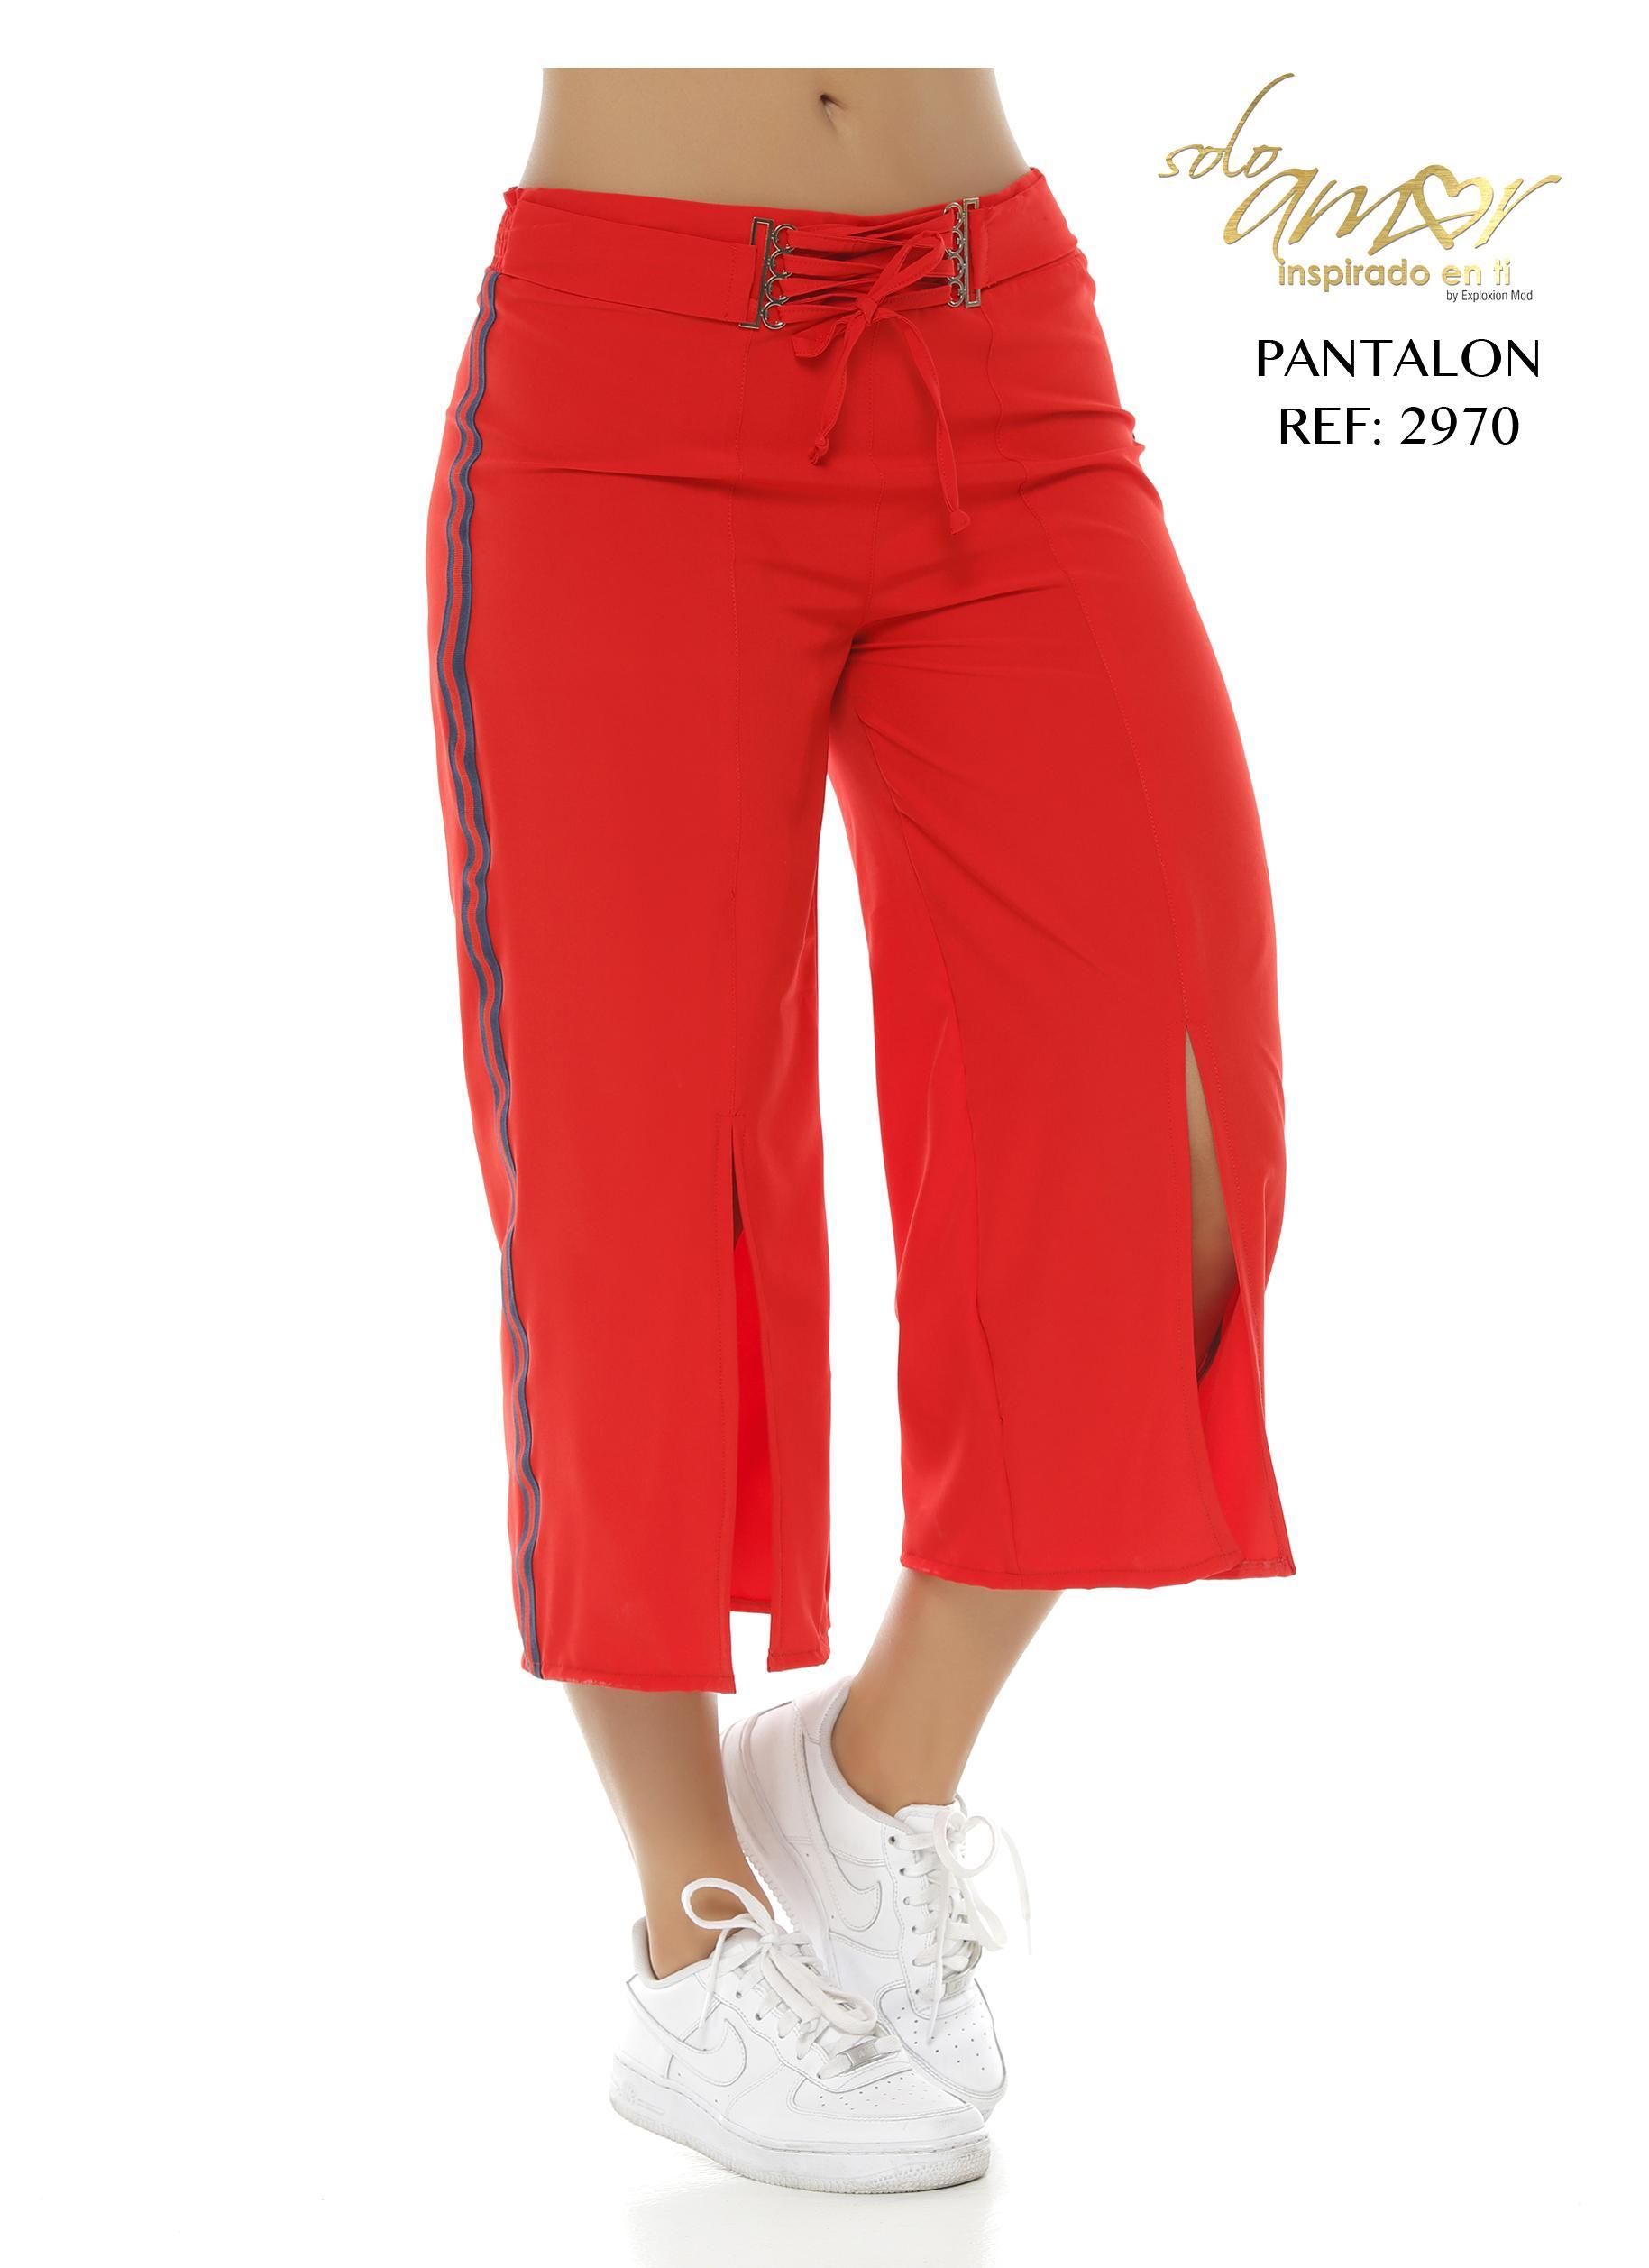 Pantalón de Dama colombiano,de moda